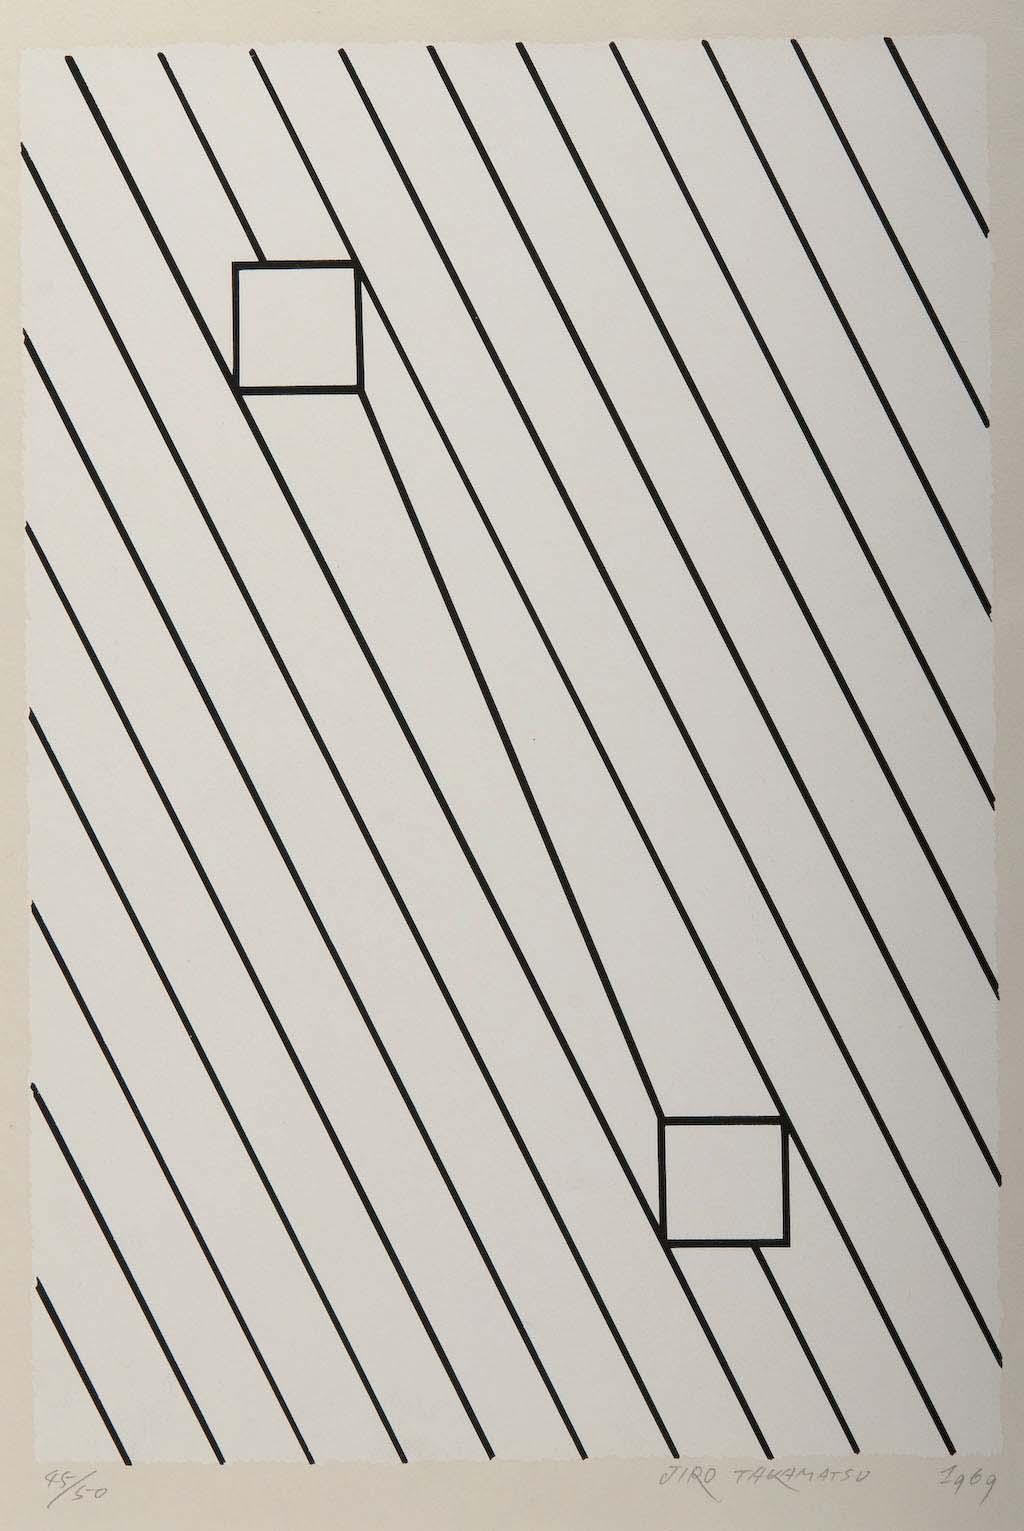 Jiro Takamatsu, 'Untitled', 1969, screenprint, Gift of Chandler Coventry 1979